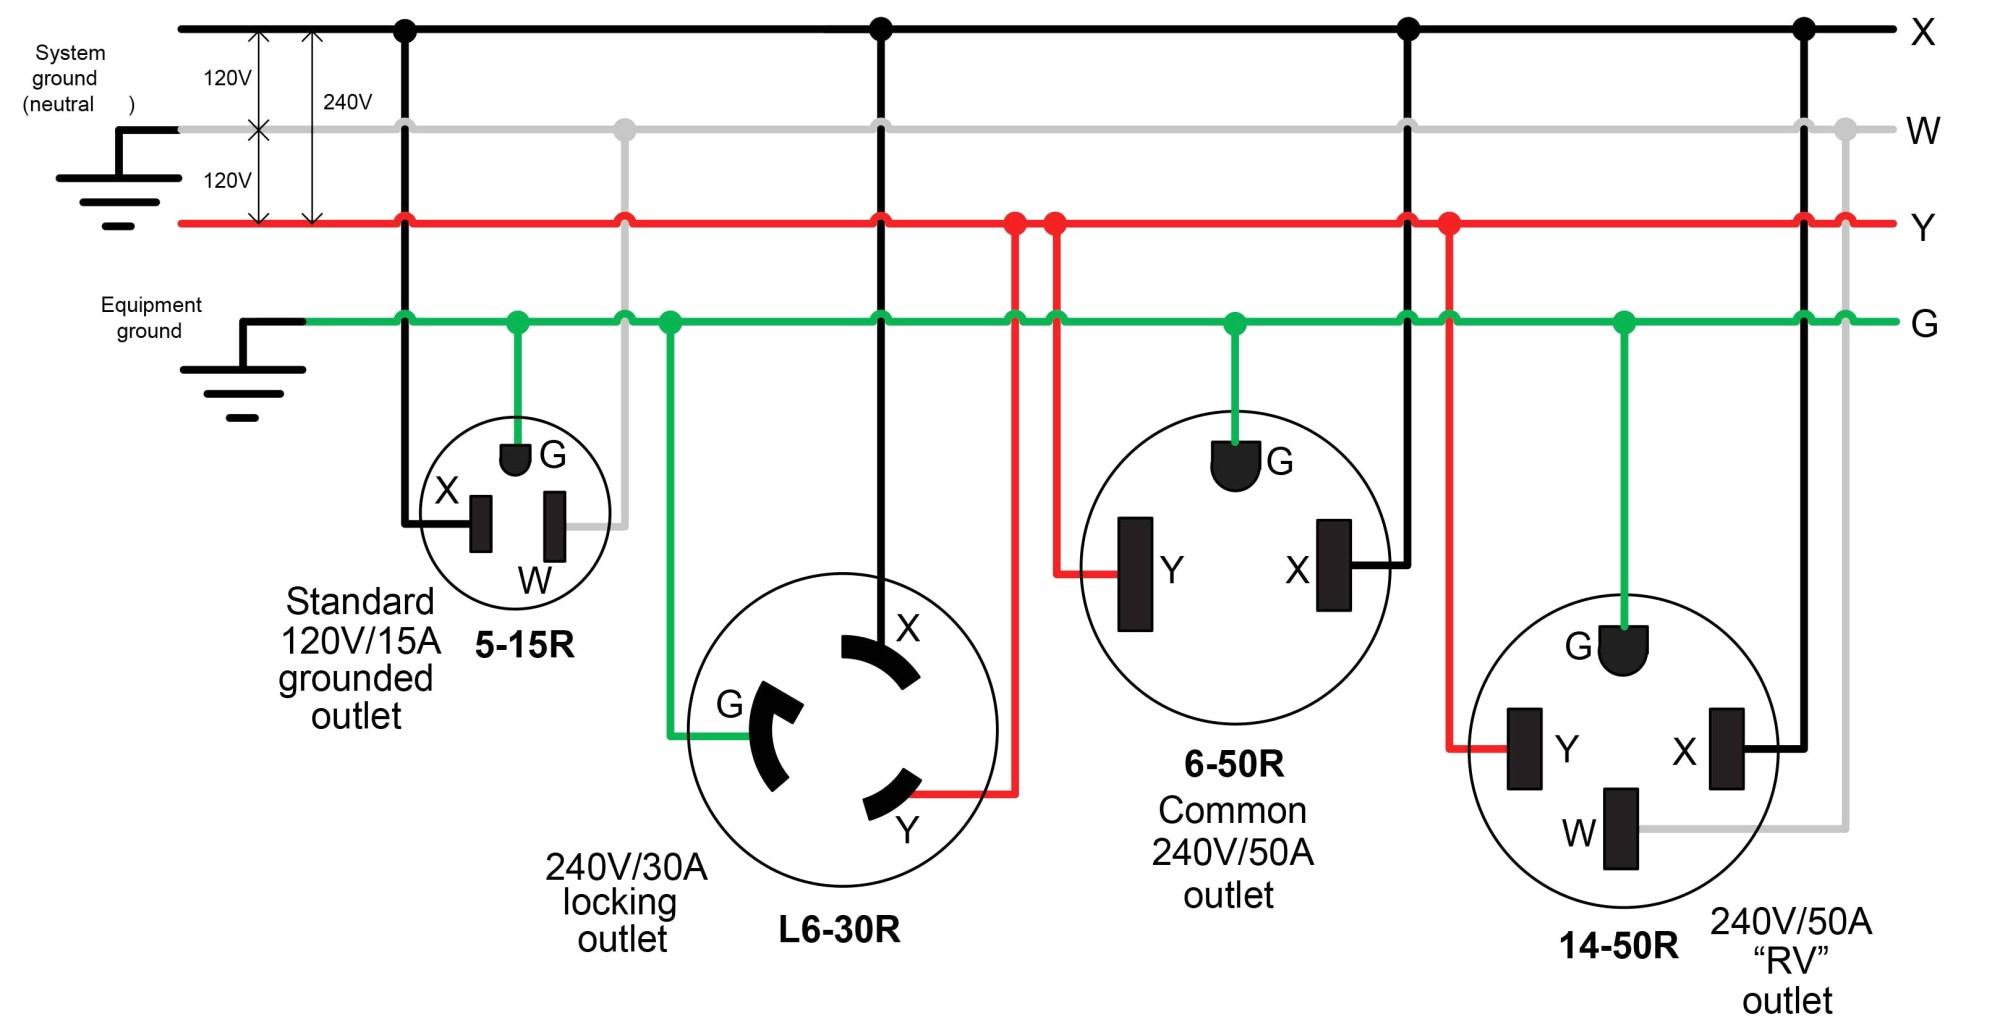 hight resolution of 30 amp generator plug wiring diagram 240v plug wiring diagram how to wire a 4